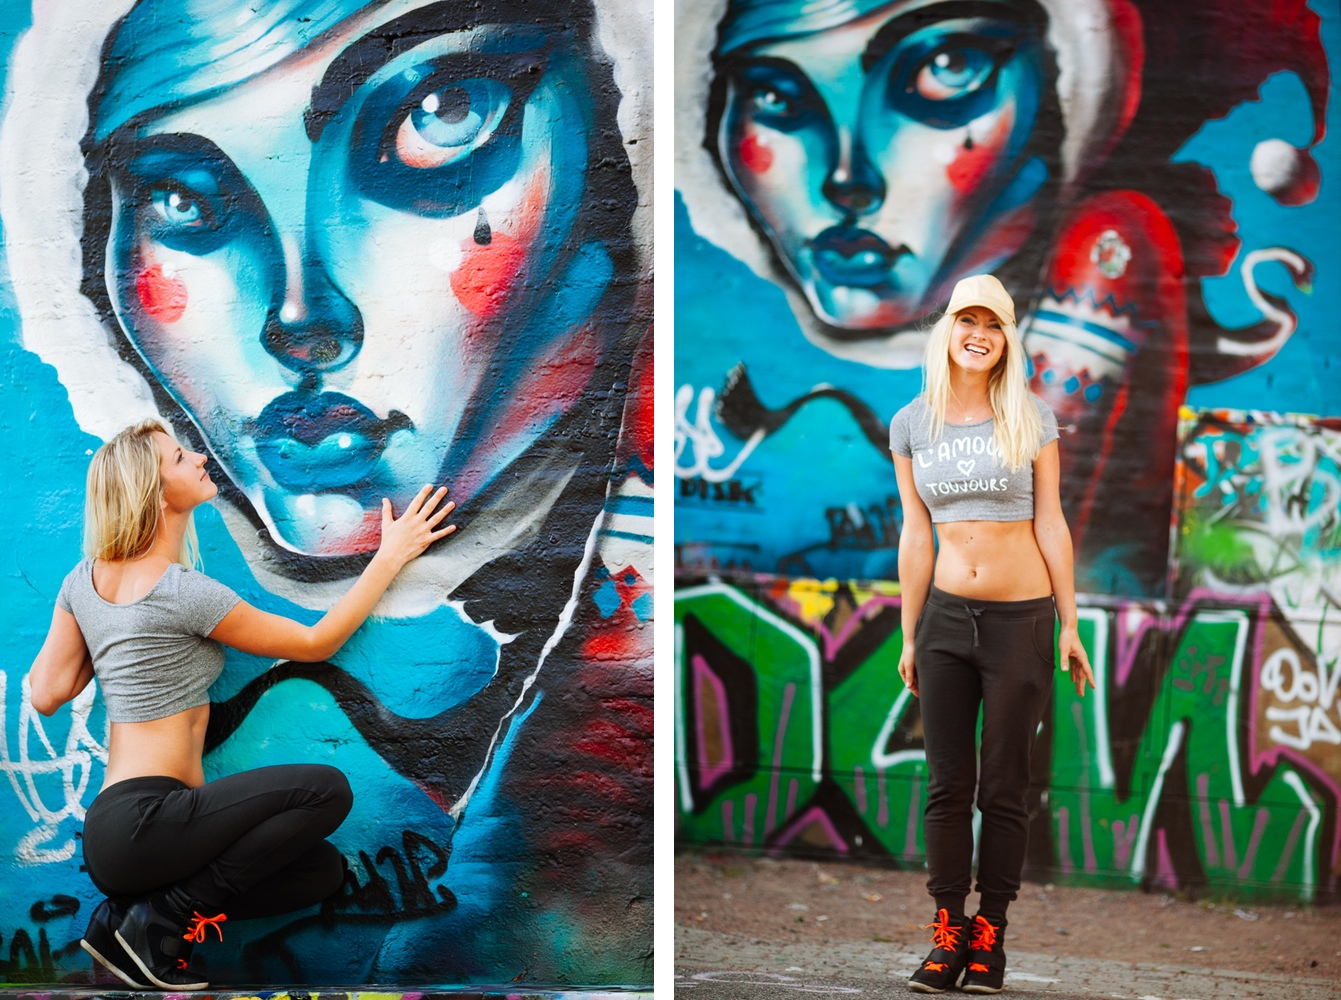 Ana_grafiti-1